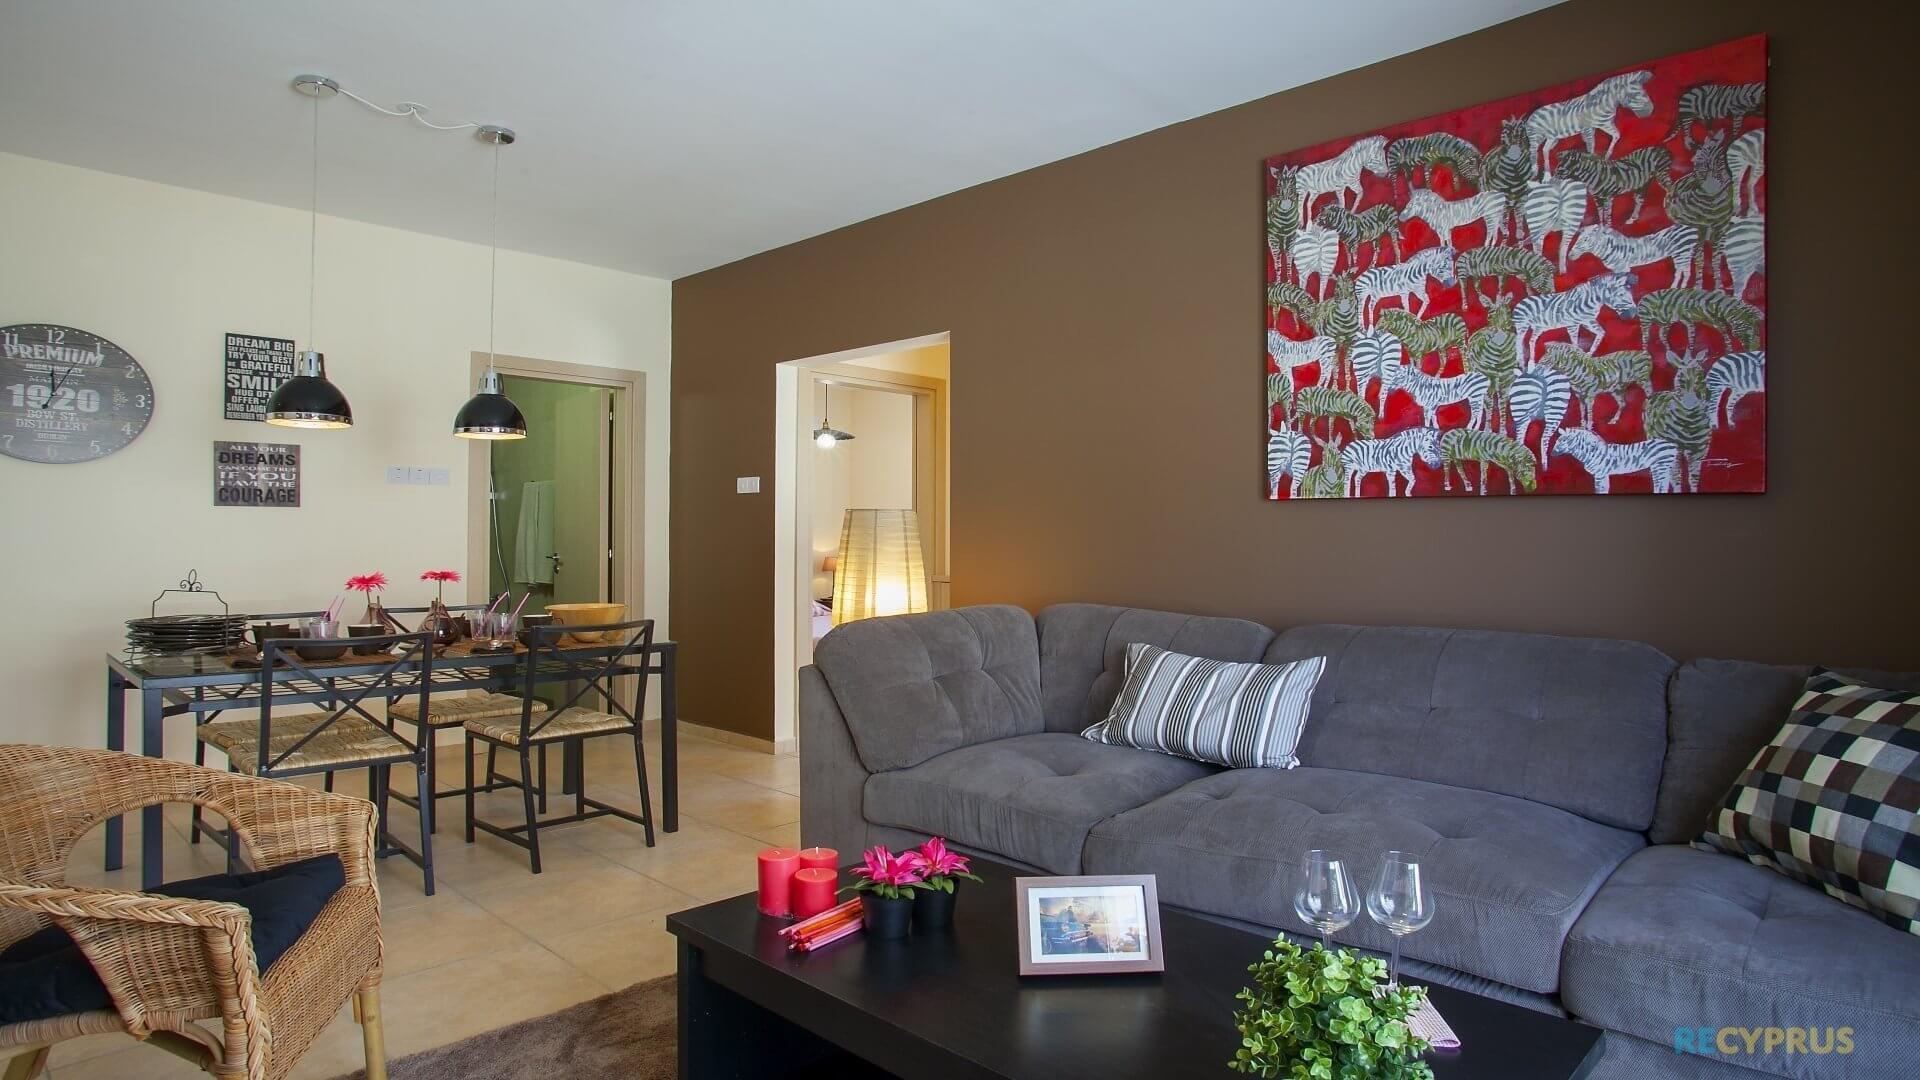 Apartment for sale Kapparis Famagusta Cyprus 2 3442